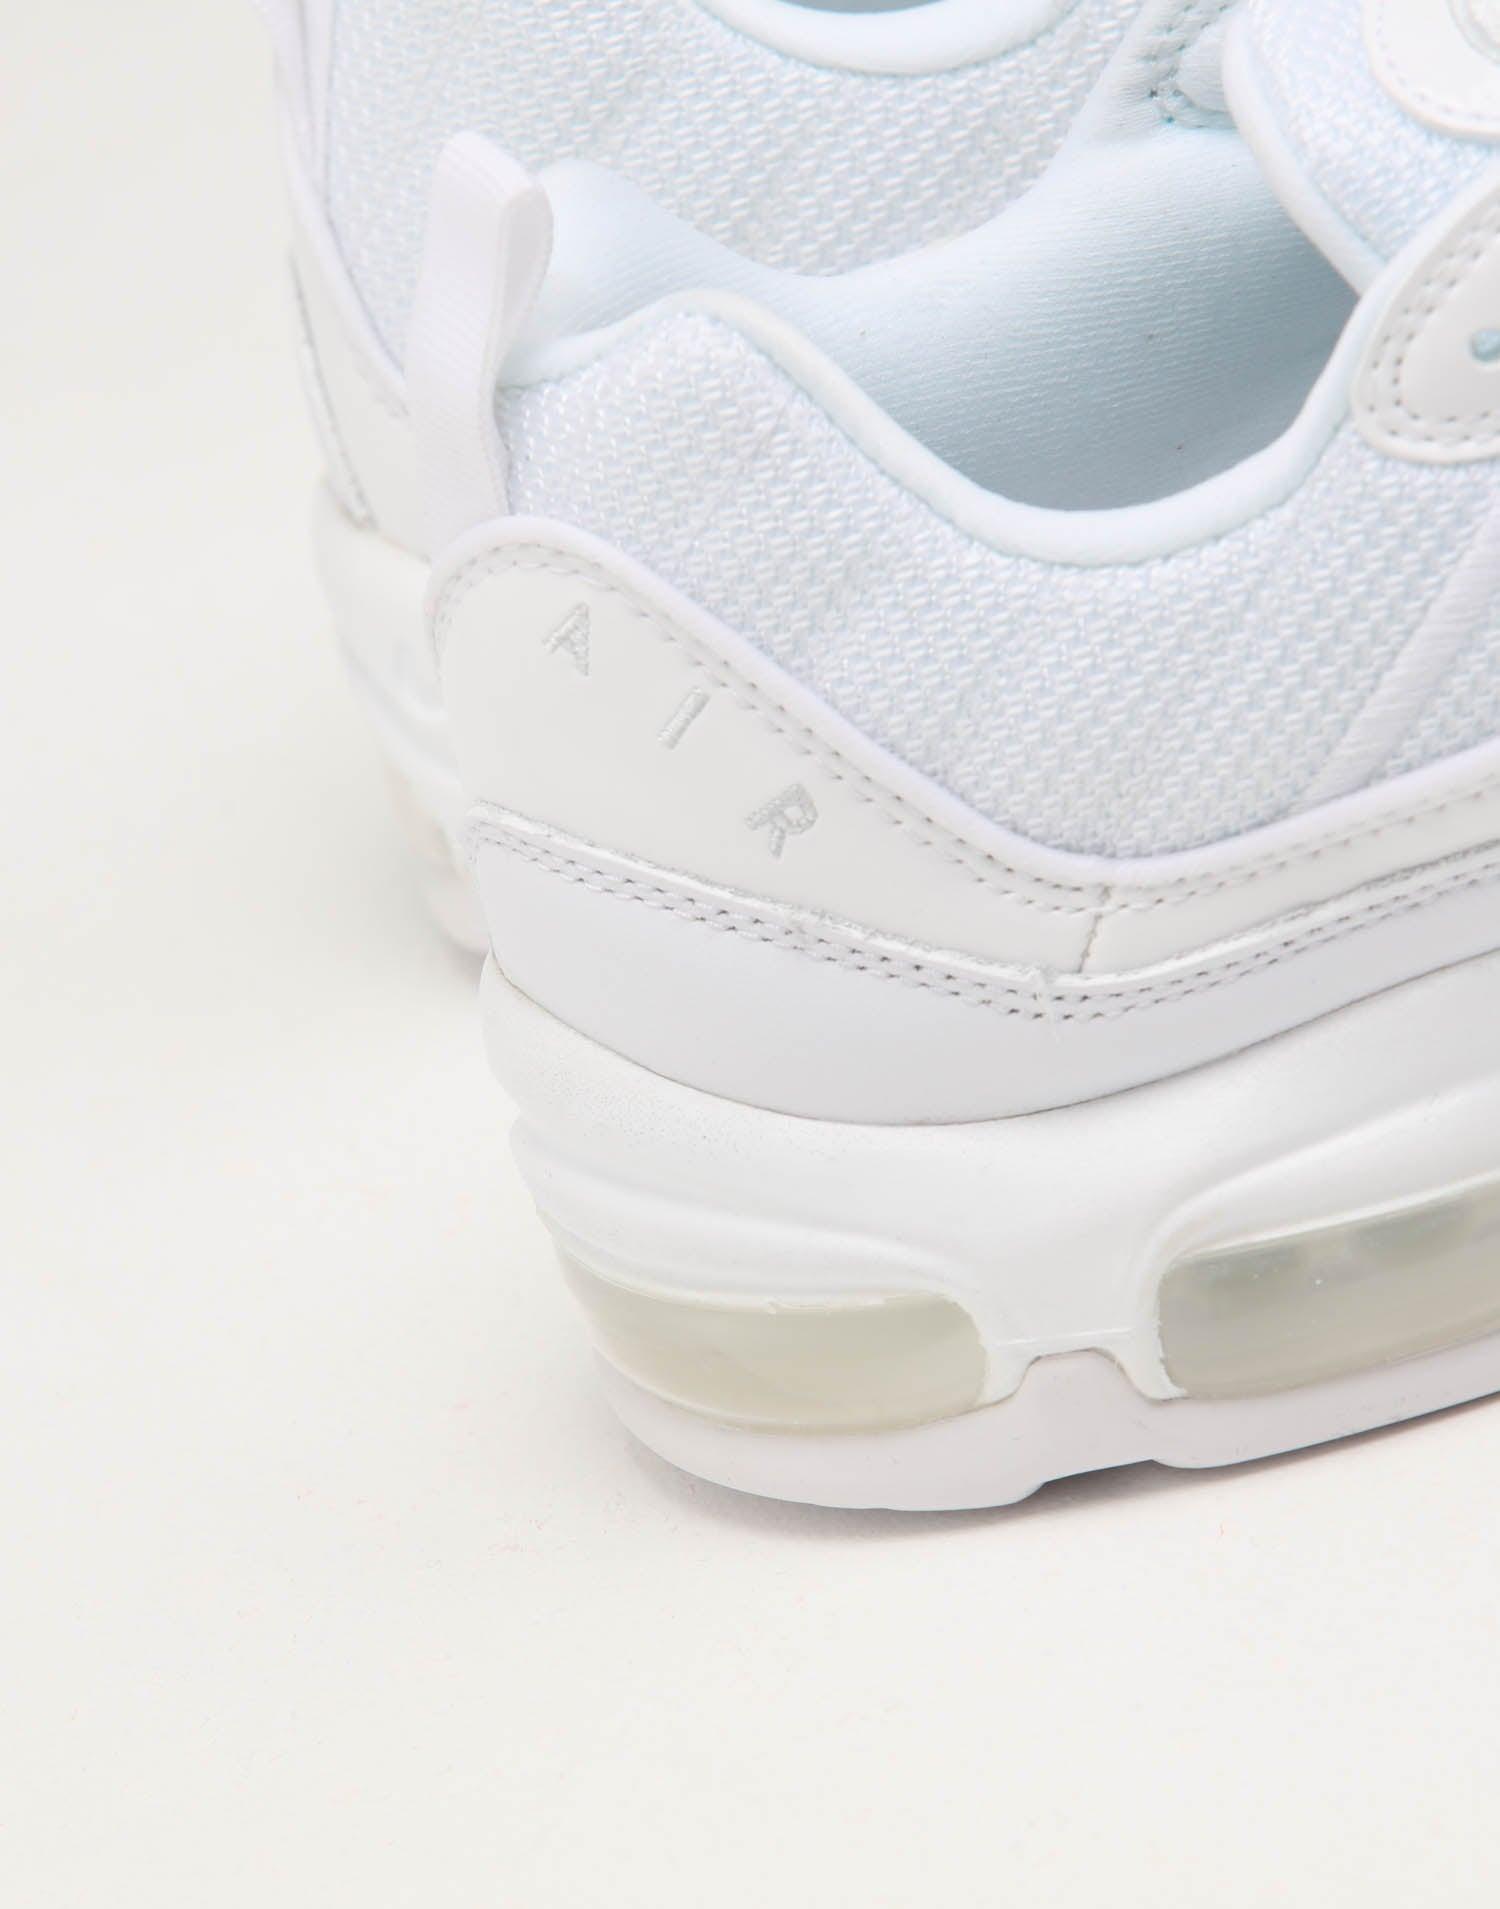 Nike Air Max 98 Premium Camo Women's Shoe. Nike CA